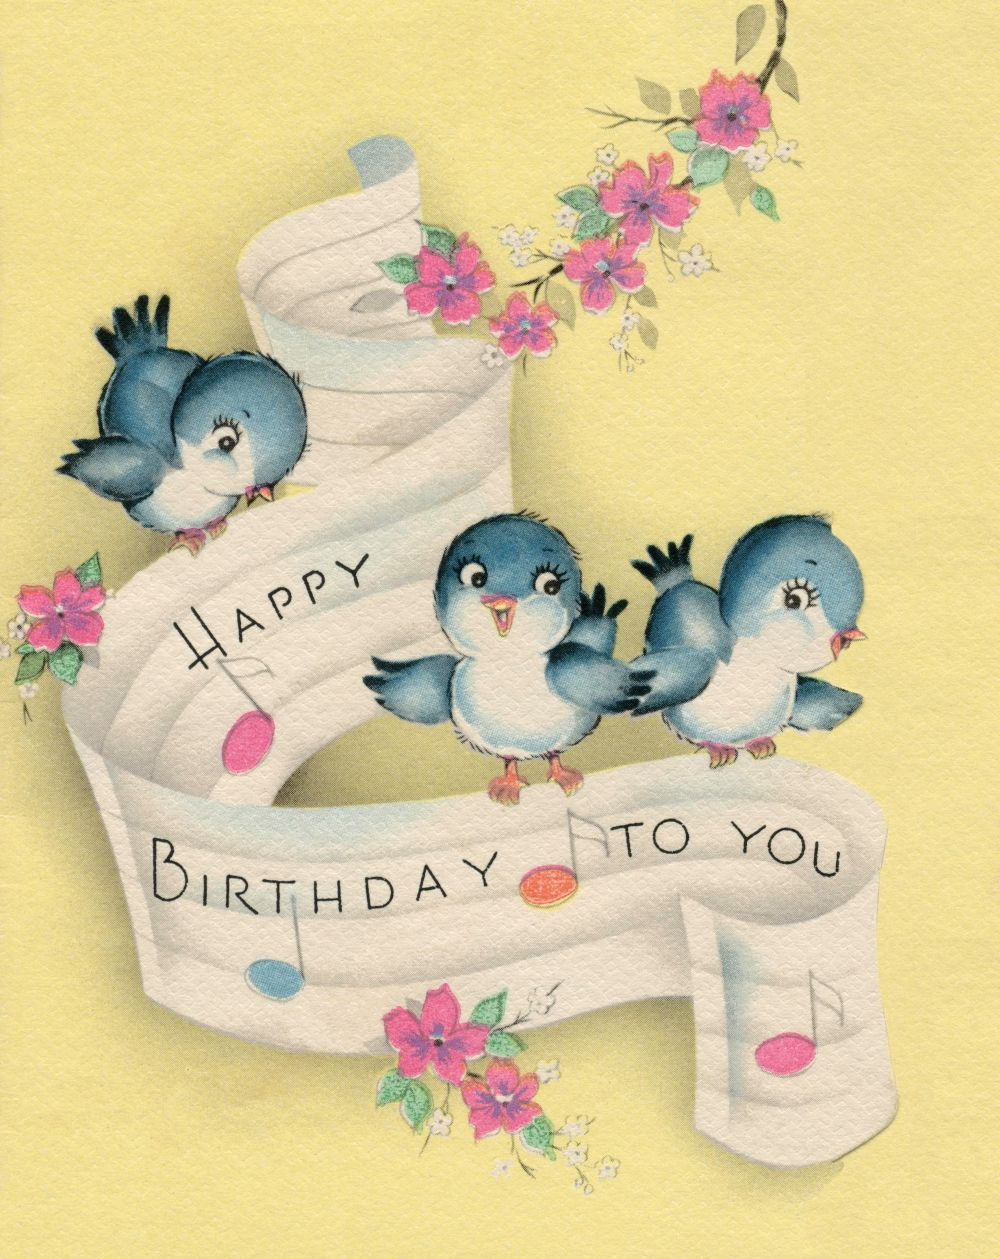 Singing Birthday Cards Facebook